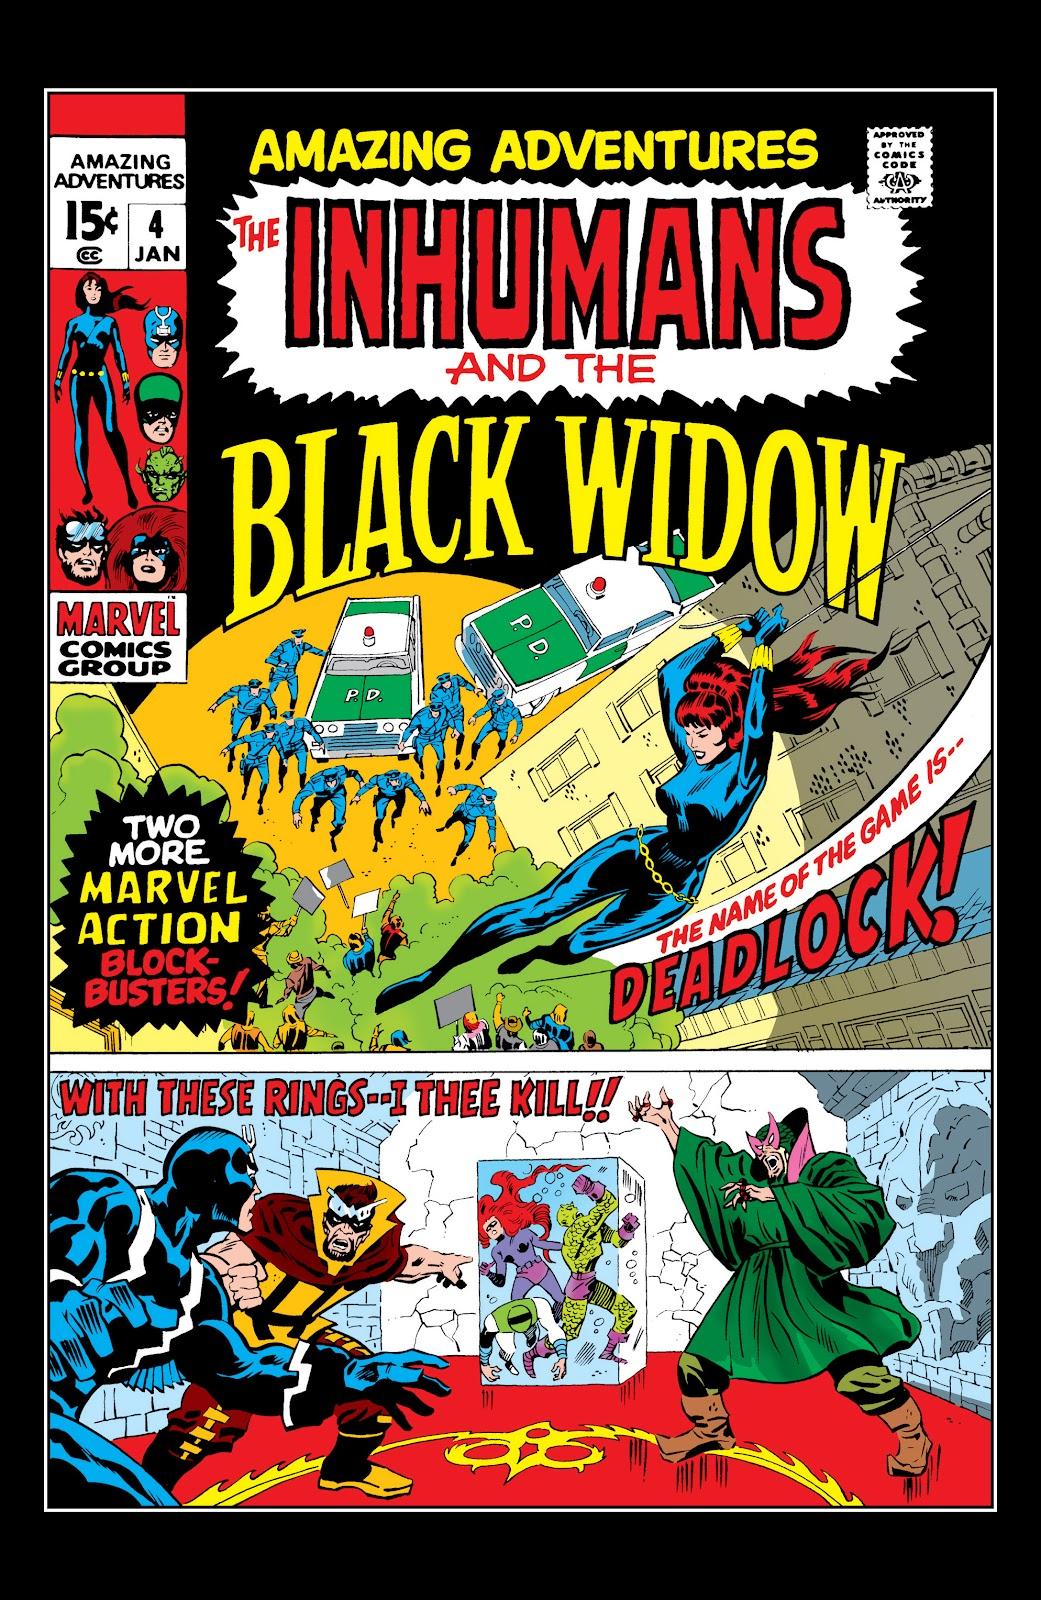 Read online Marvel Masterworks: The Inhumans comic -  Issue # TPB 1 (Part 2) - 2